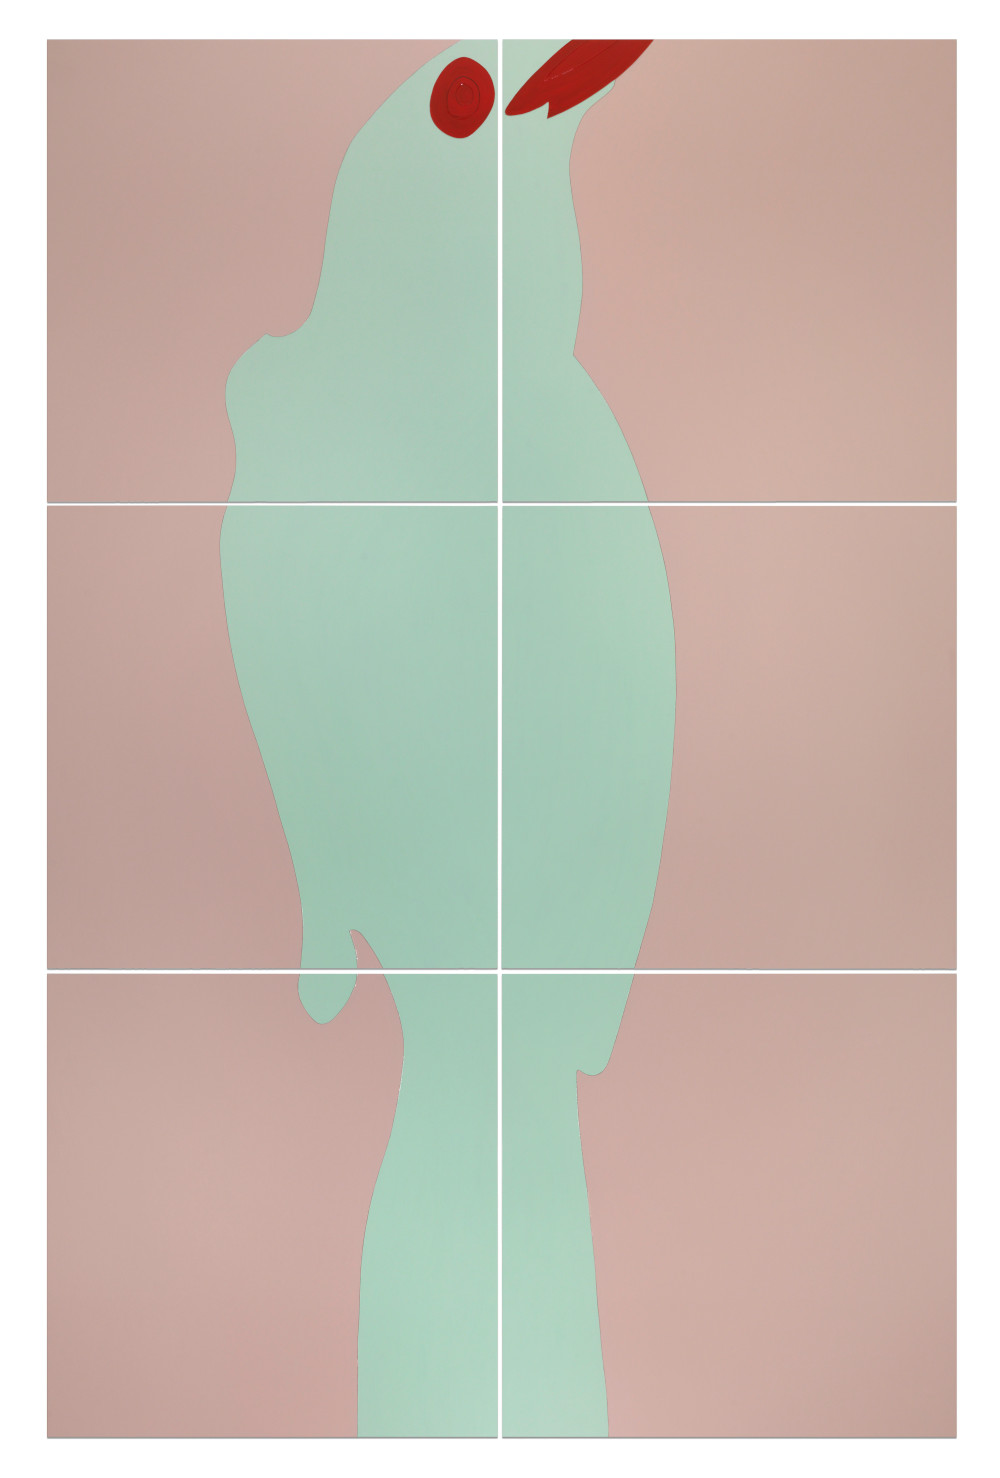 Gary Hume, Big Bird, 2010